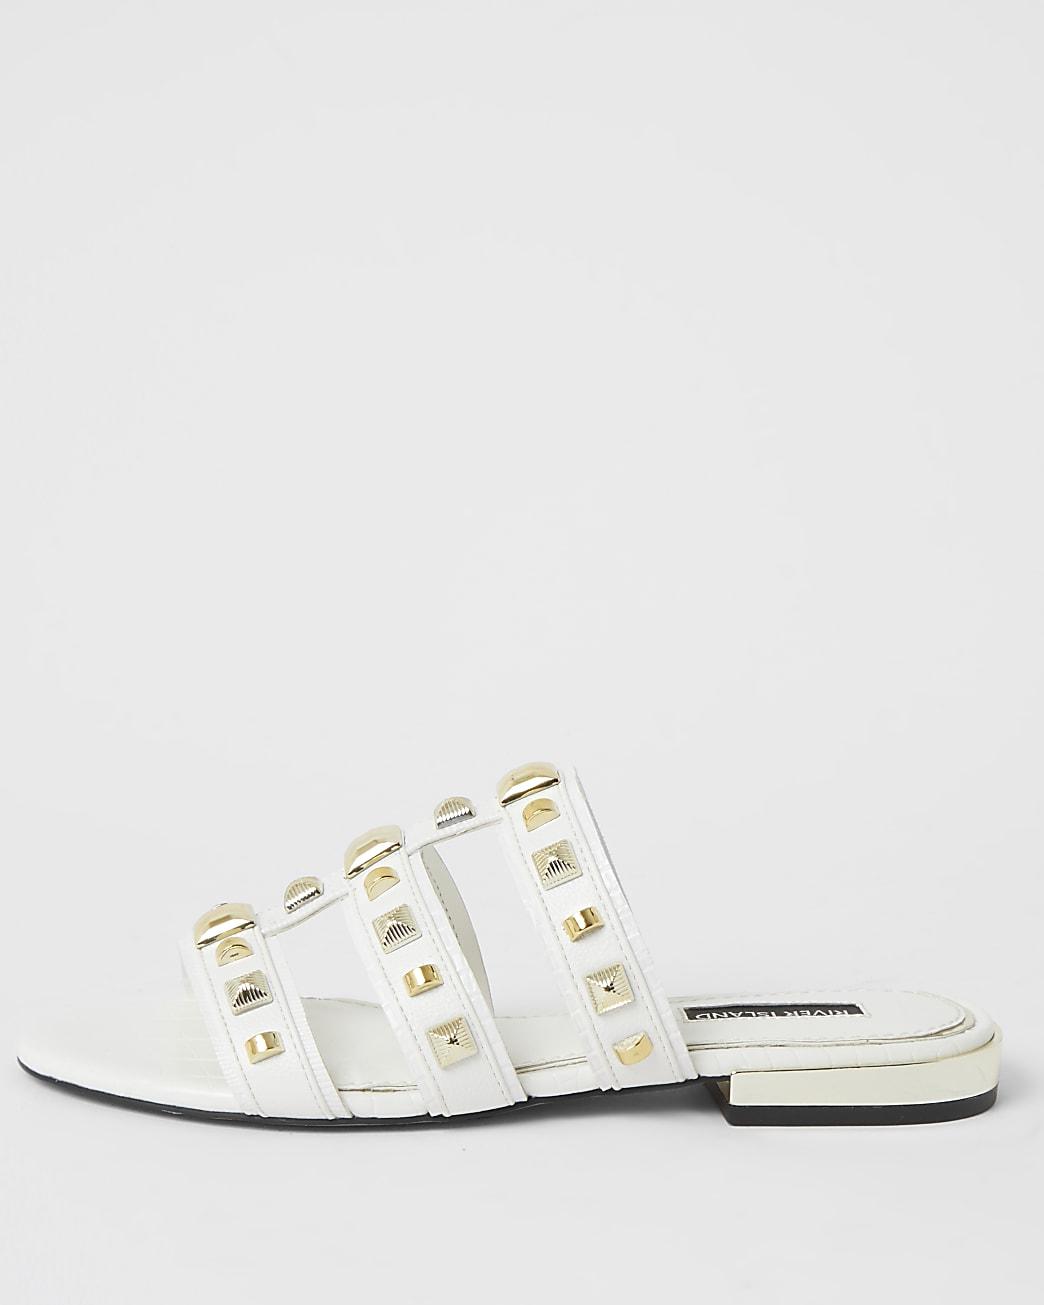 White caged studded flat Mule sandal